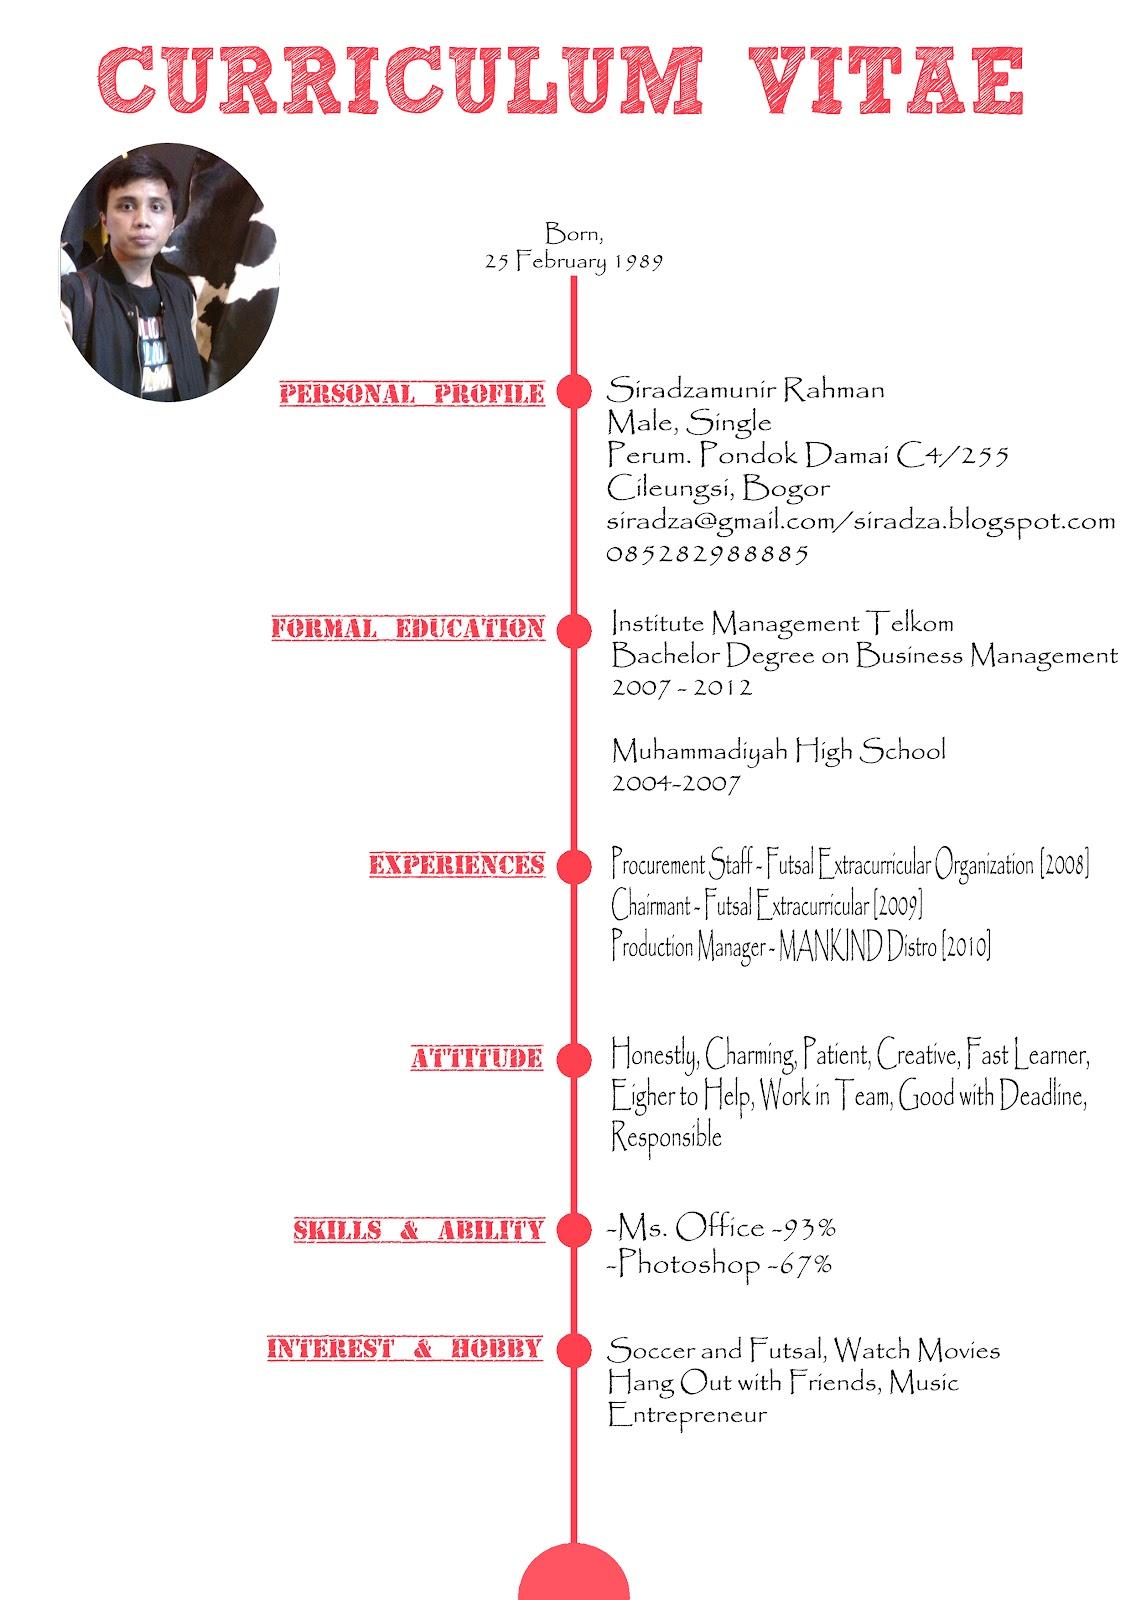 Kumpulan Contoh Curriculum Vitae Cv Surat Riwayat Hidup Lamaran